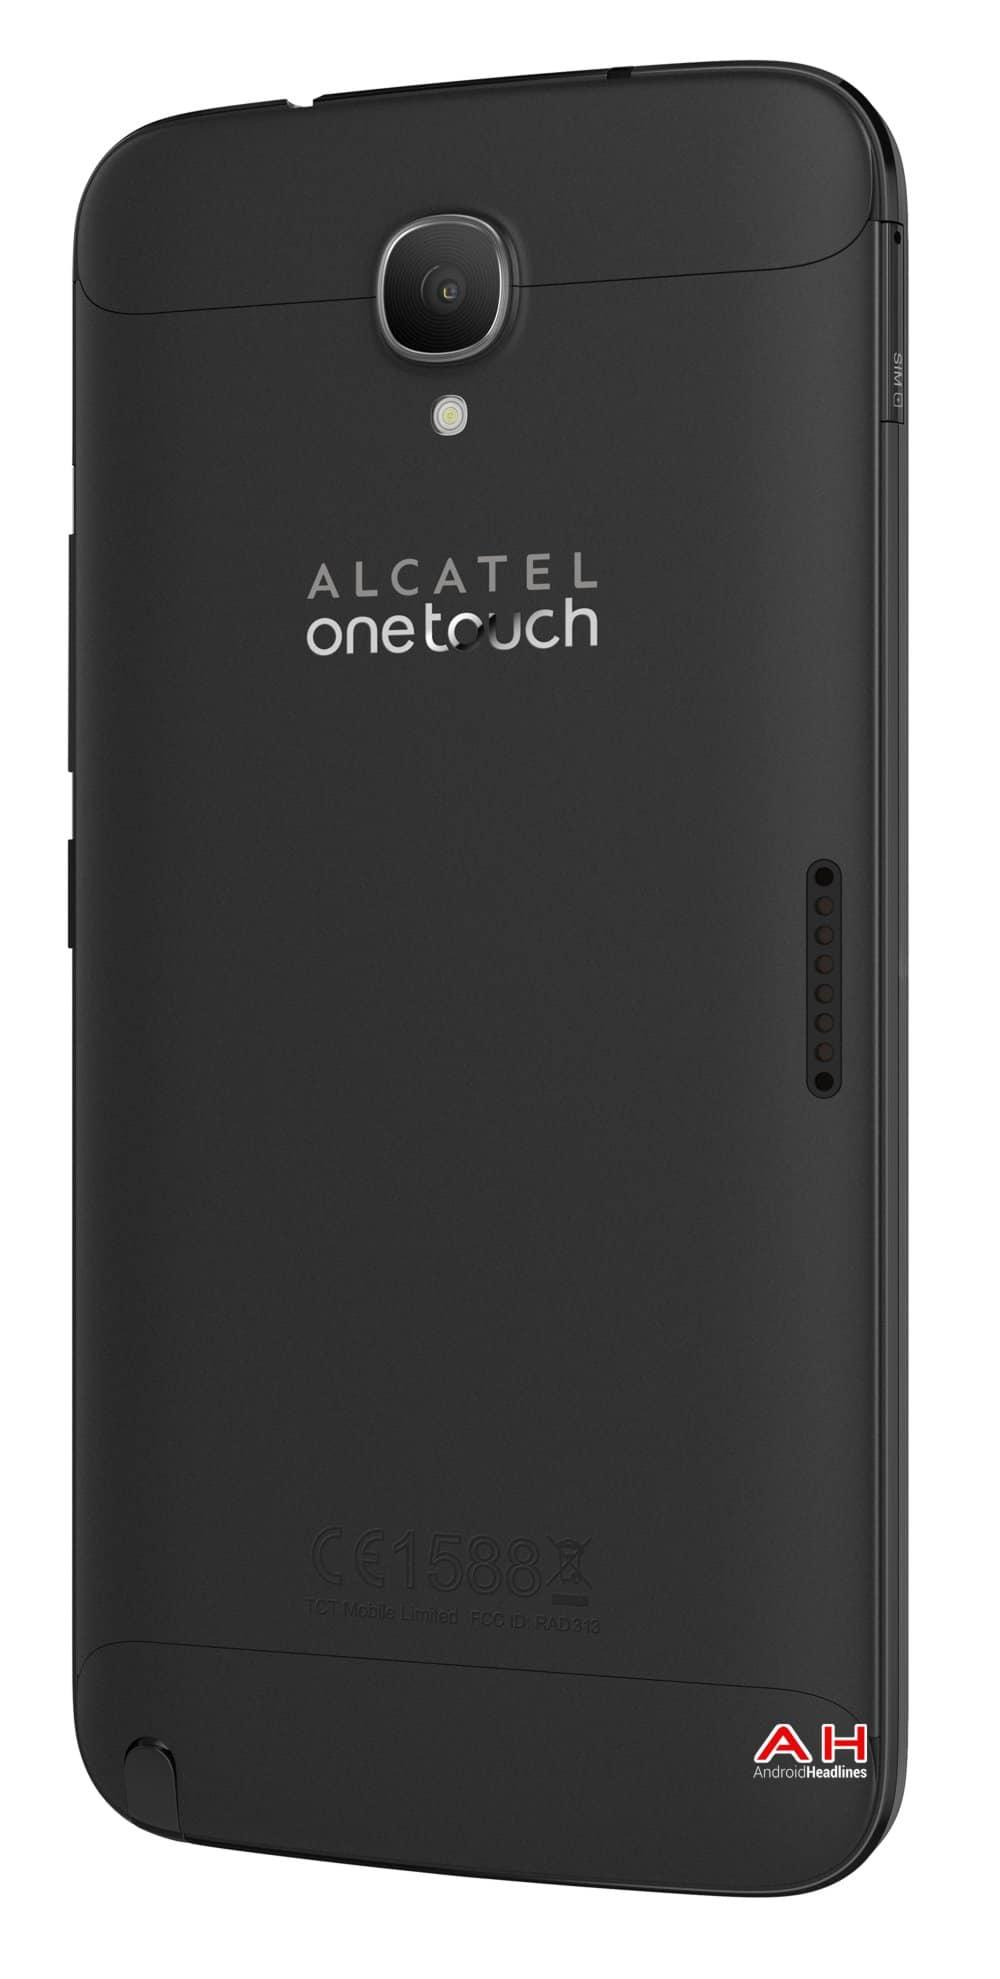 ALCATEL ONETOUCH HERO 2 3 AH